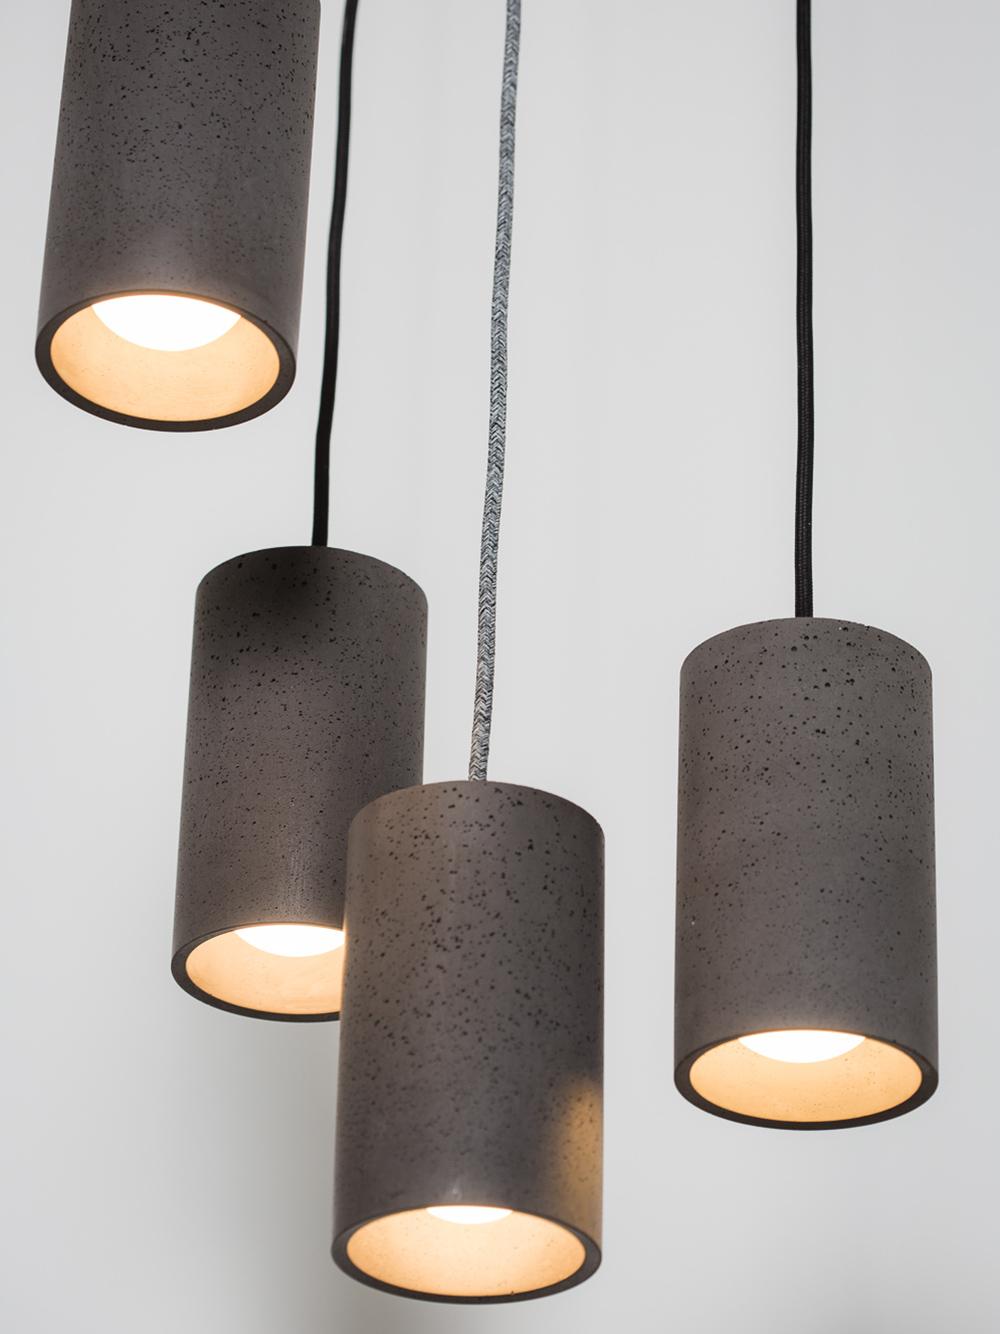 Toob Concrete Pendant Lights 50% Grey